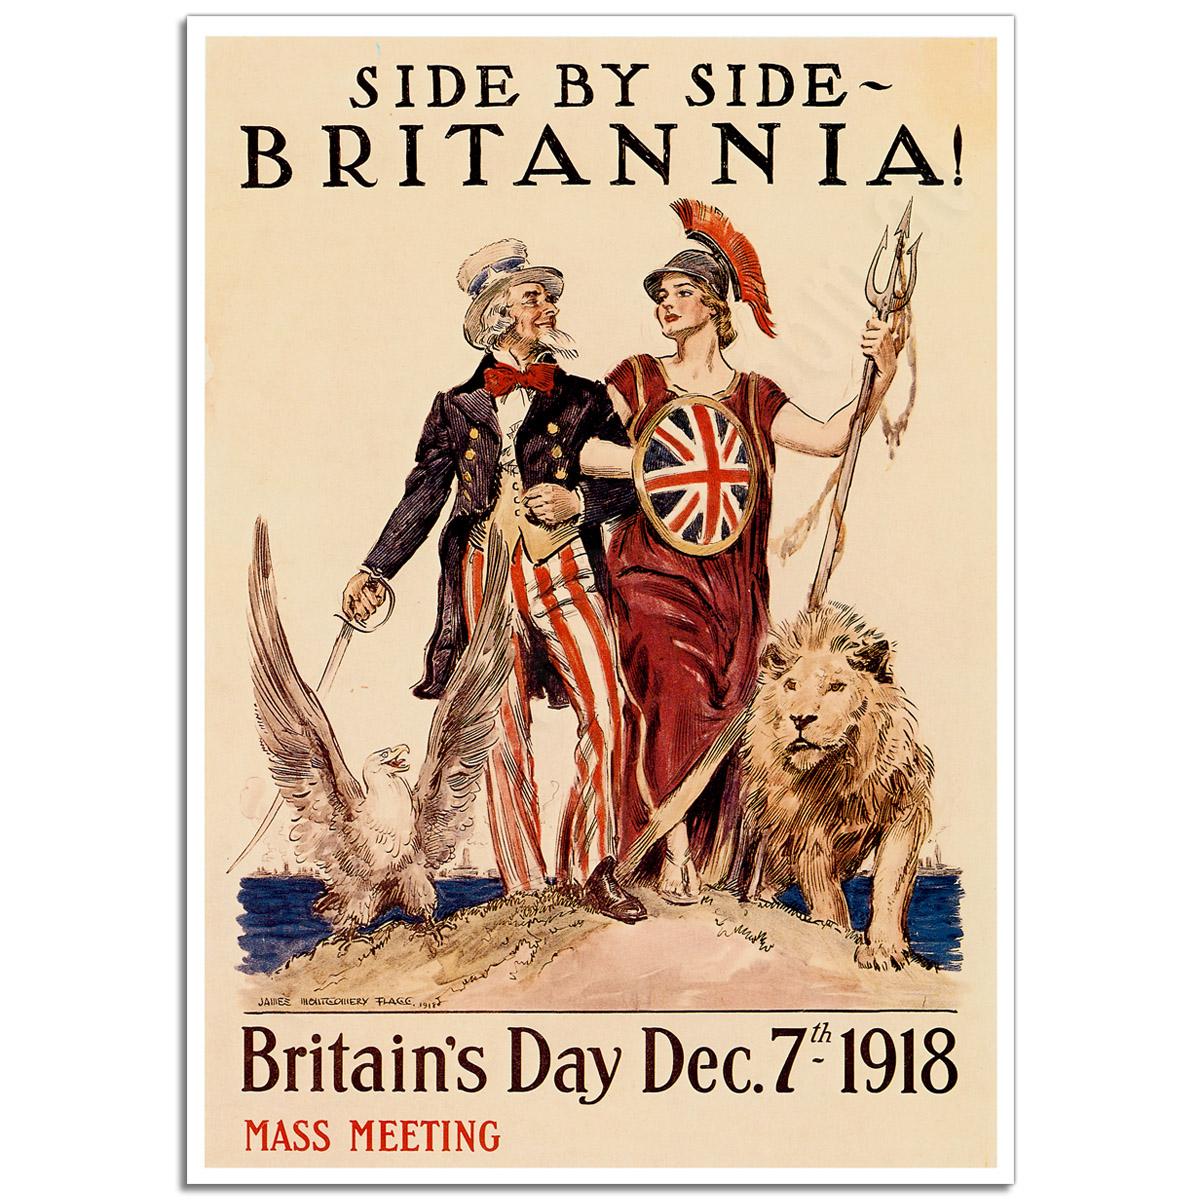 WW1 Poster - Side by Side Britannia